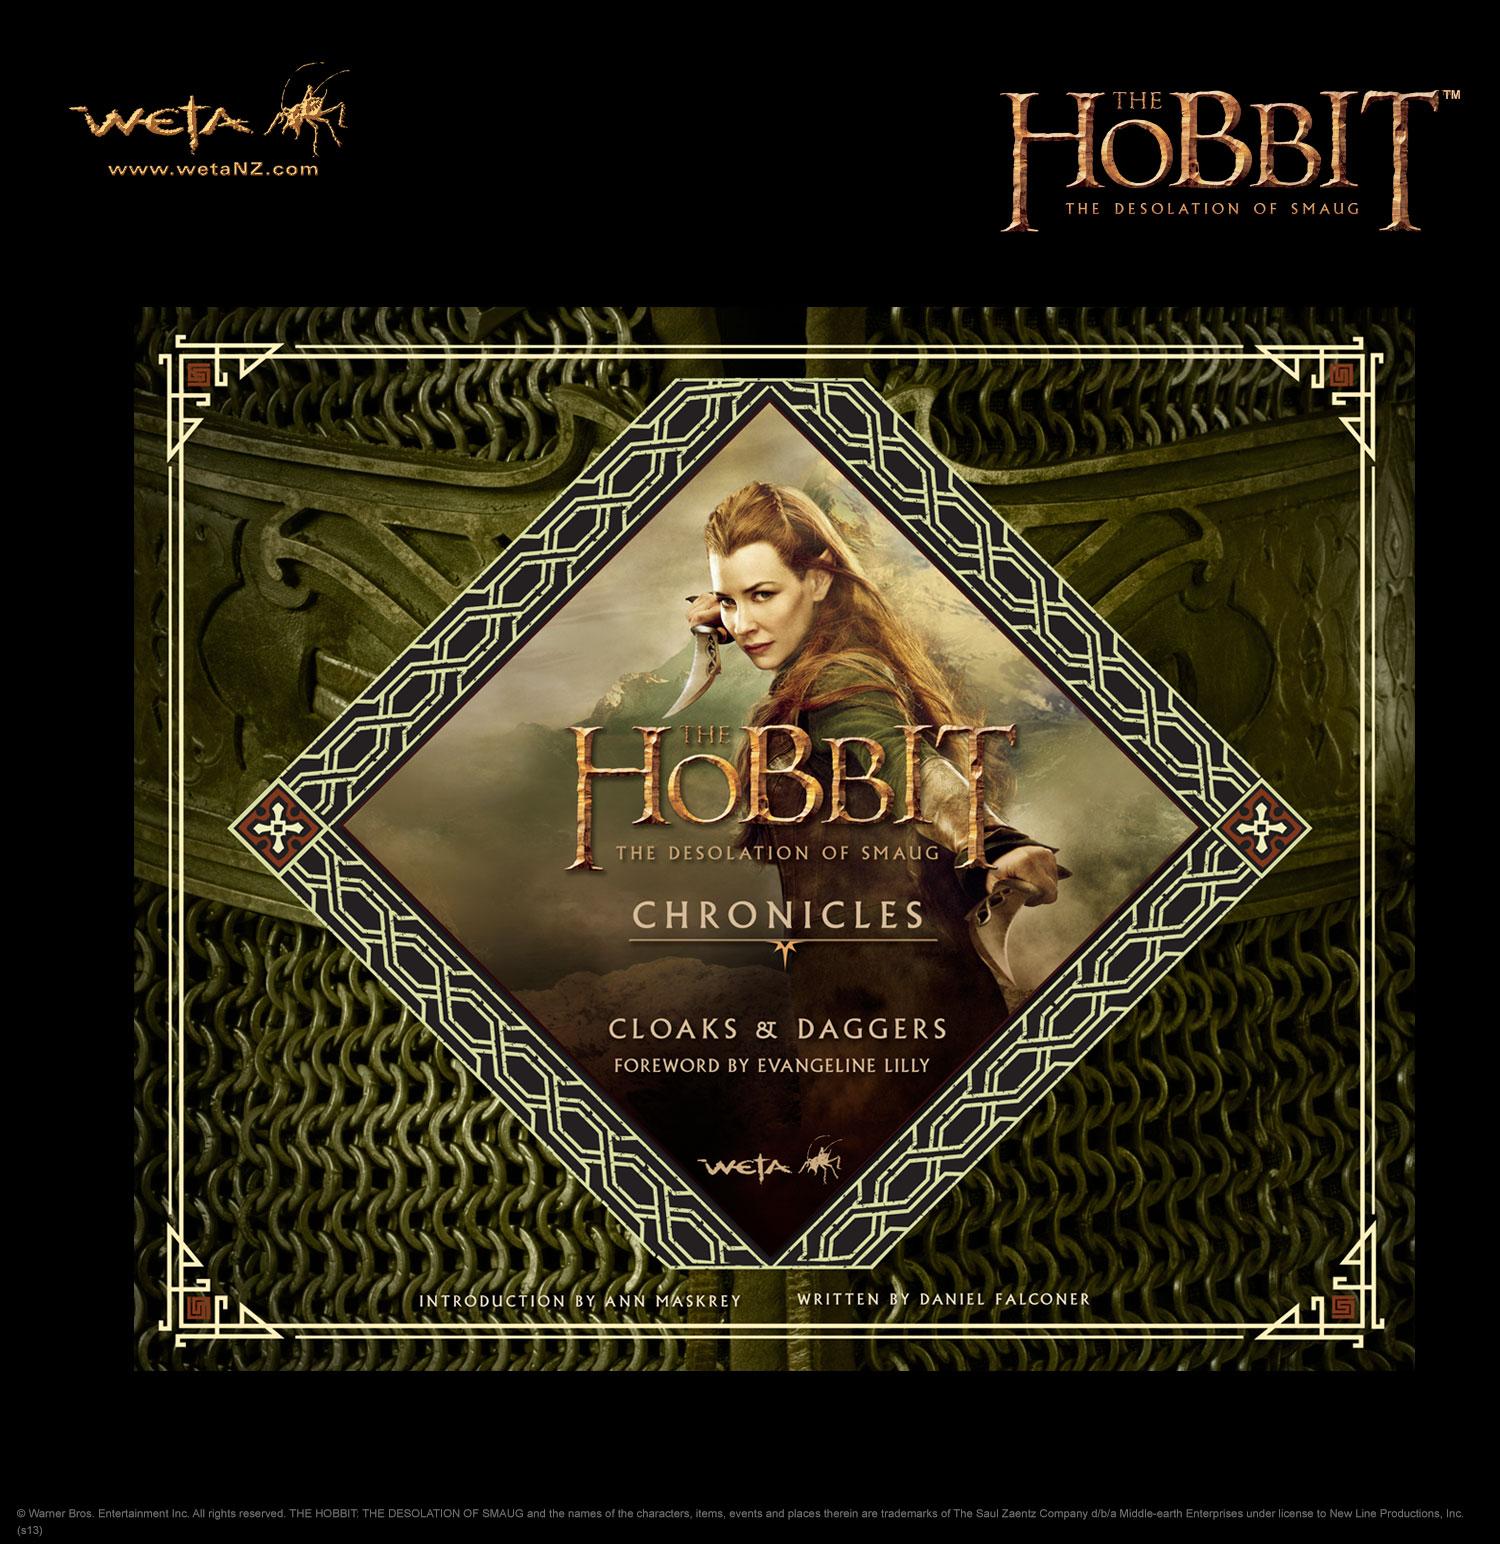 Film sur les Nains ? Hobbit-chroniclesDoSCloaksDaggersa2